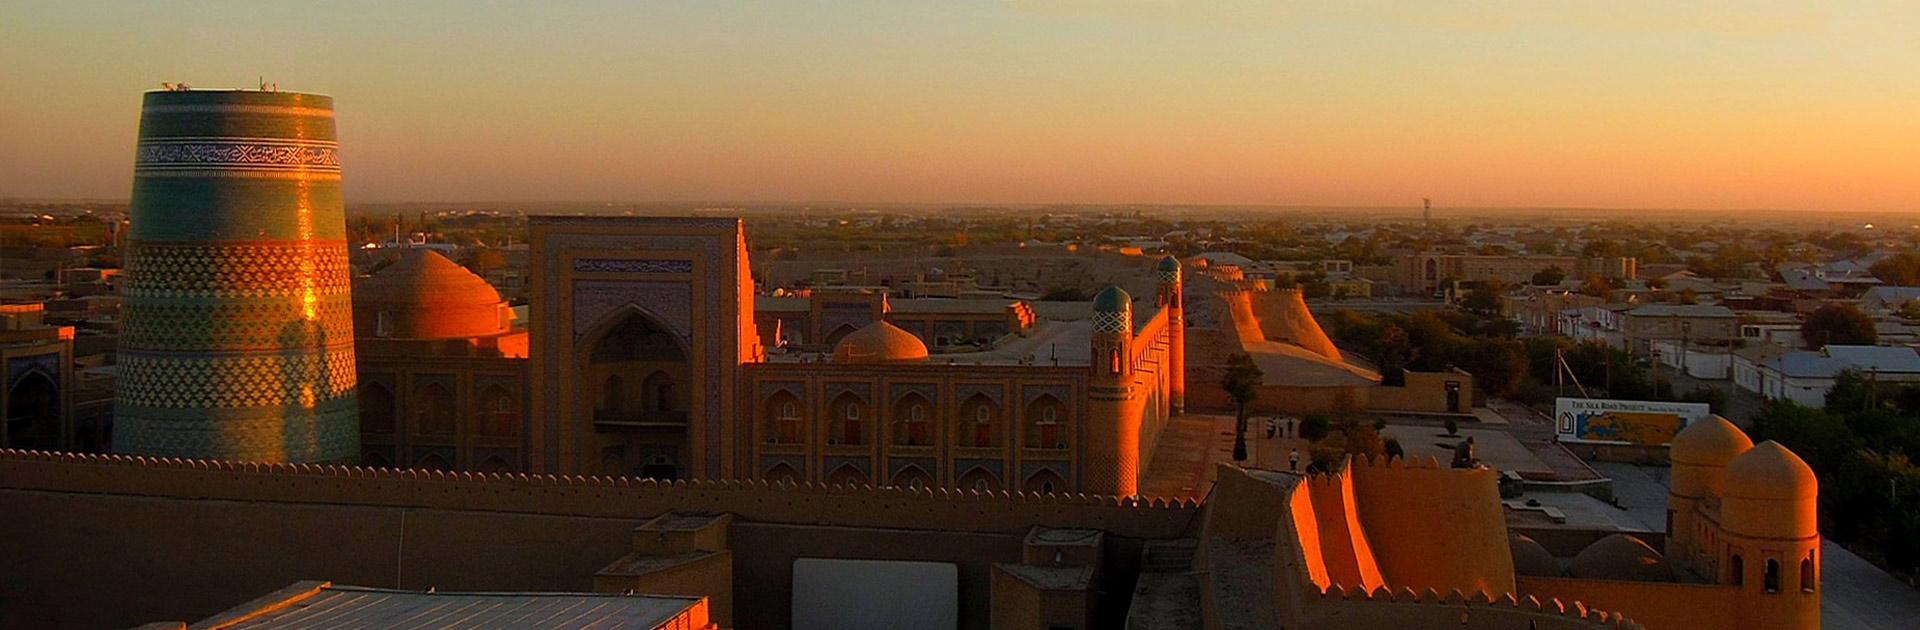 UZ Uzbekistán Espíritu del Pasado 8 días 3